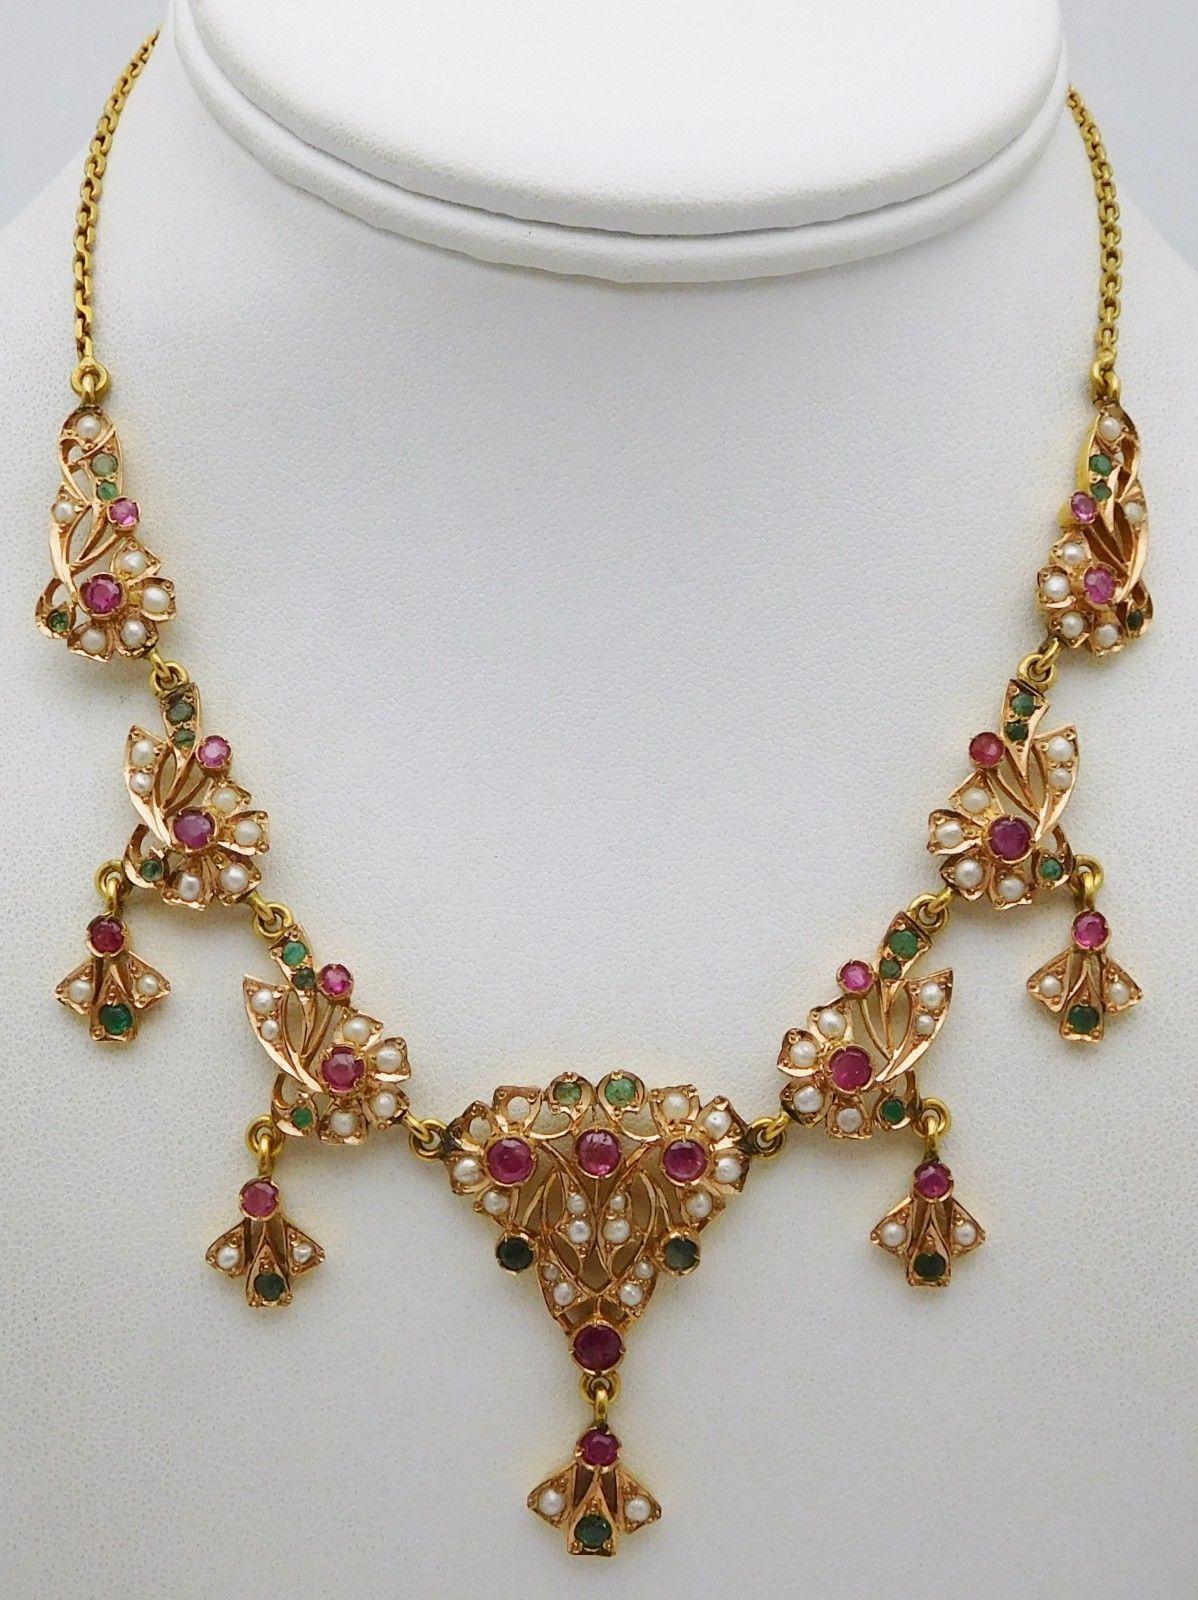 ac56cca4b1b1a6 AMAZING Solid 14k Yellow Gold / Ruby / Pearls / Emeralds Ladies Festoon  Necklace | eBay